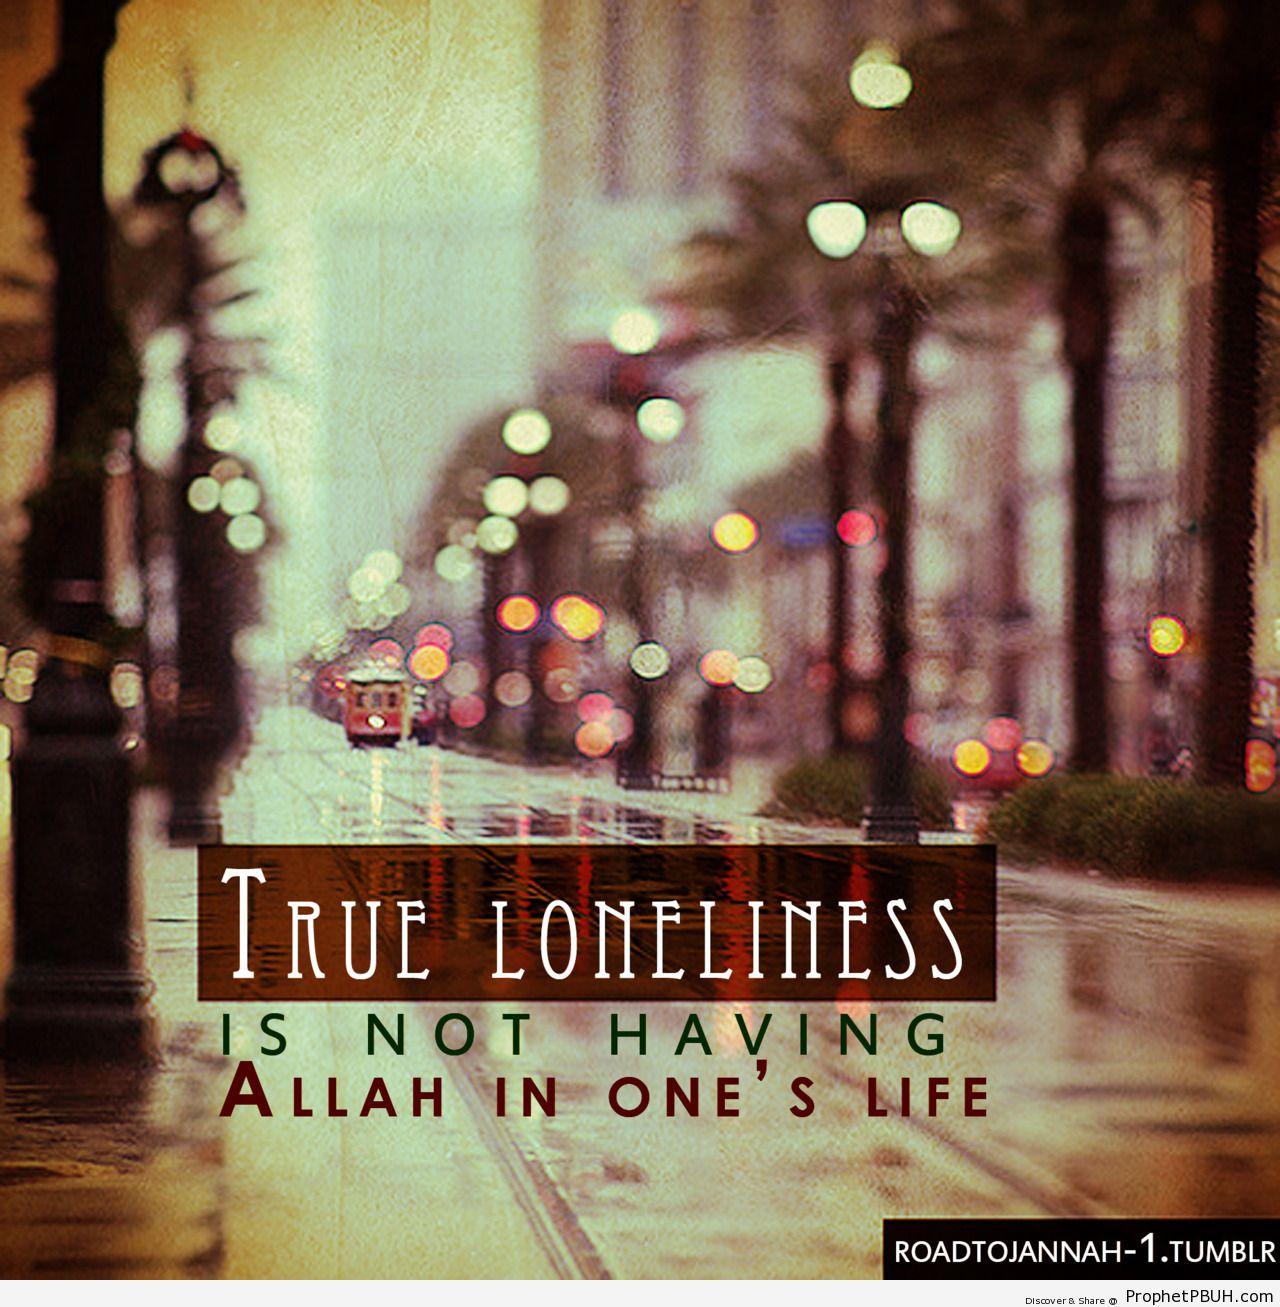 True loneliness - Islamic Quotes, Hadiths, Duas